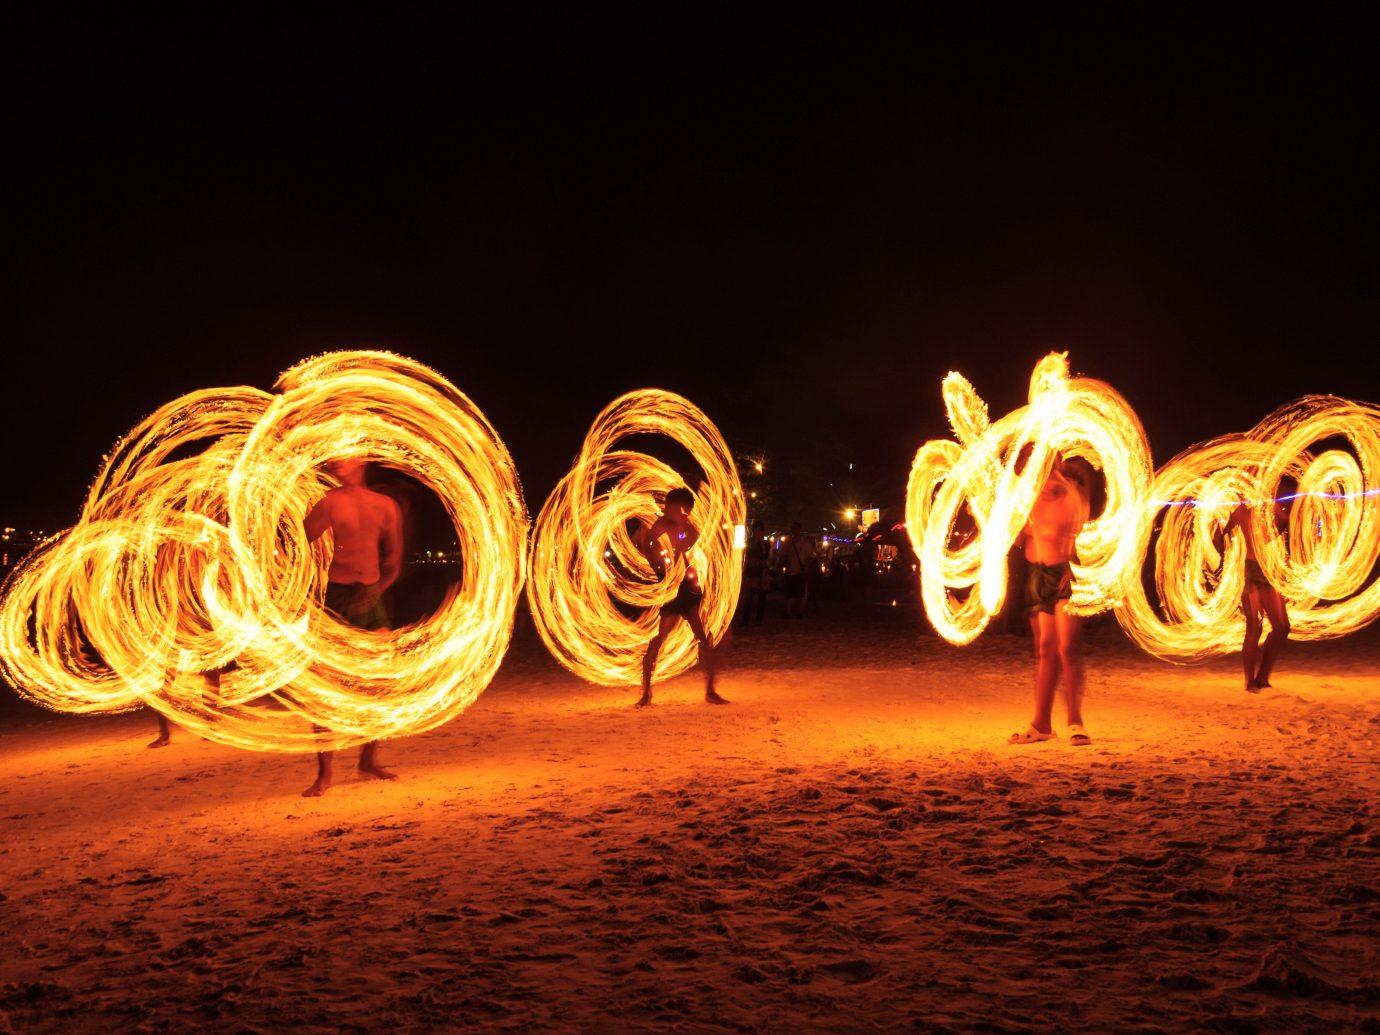 Beach Design Jetsetter Guides Nightlife Outdoor Activities poi night light font wheel darkness dance lighting event number dark